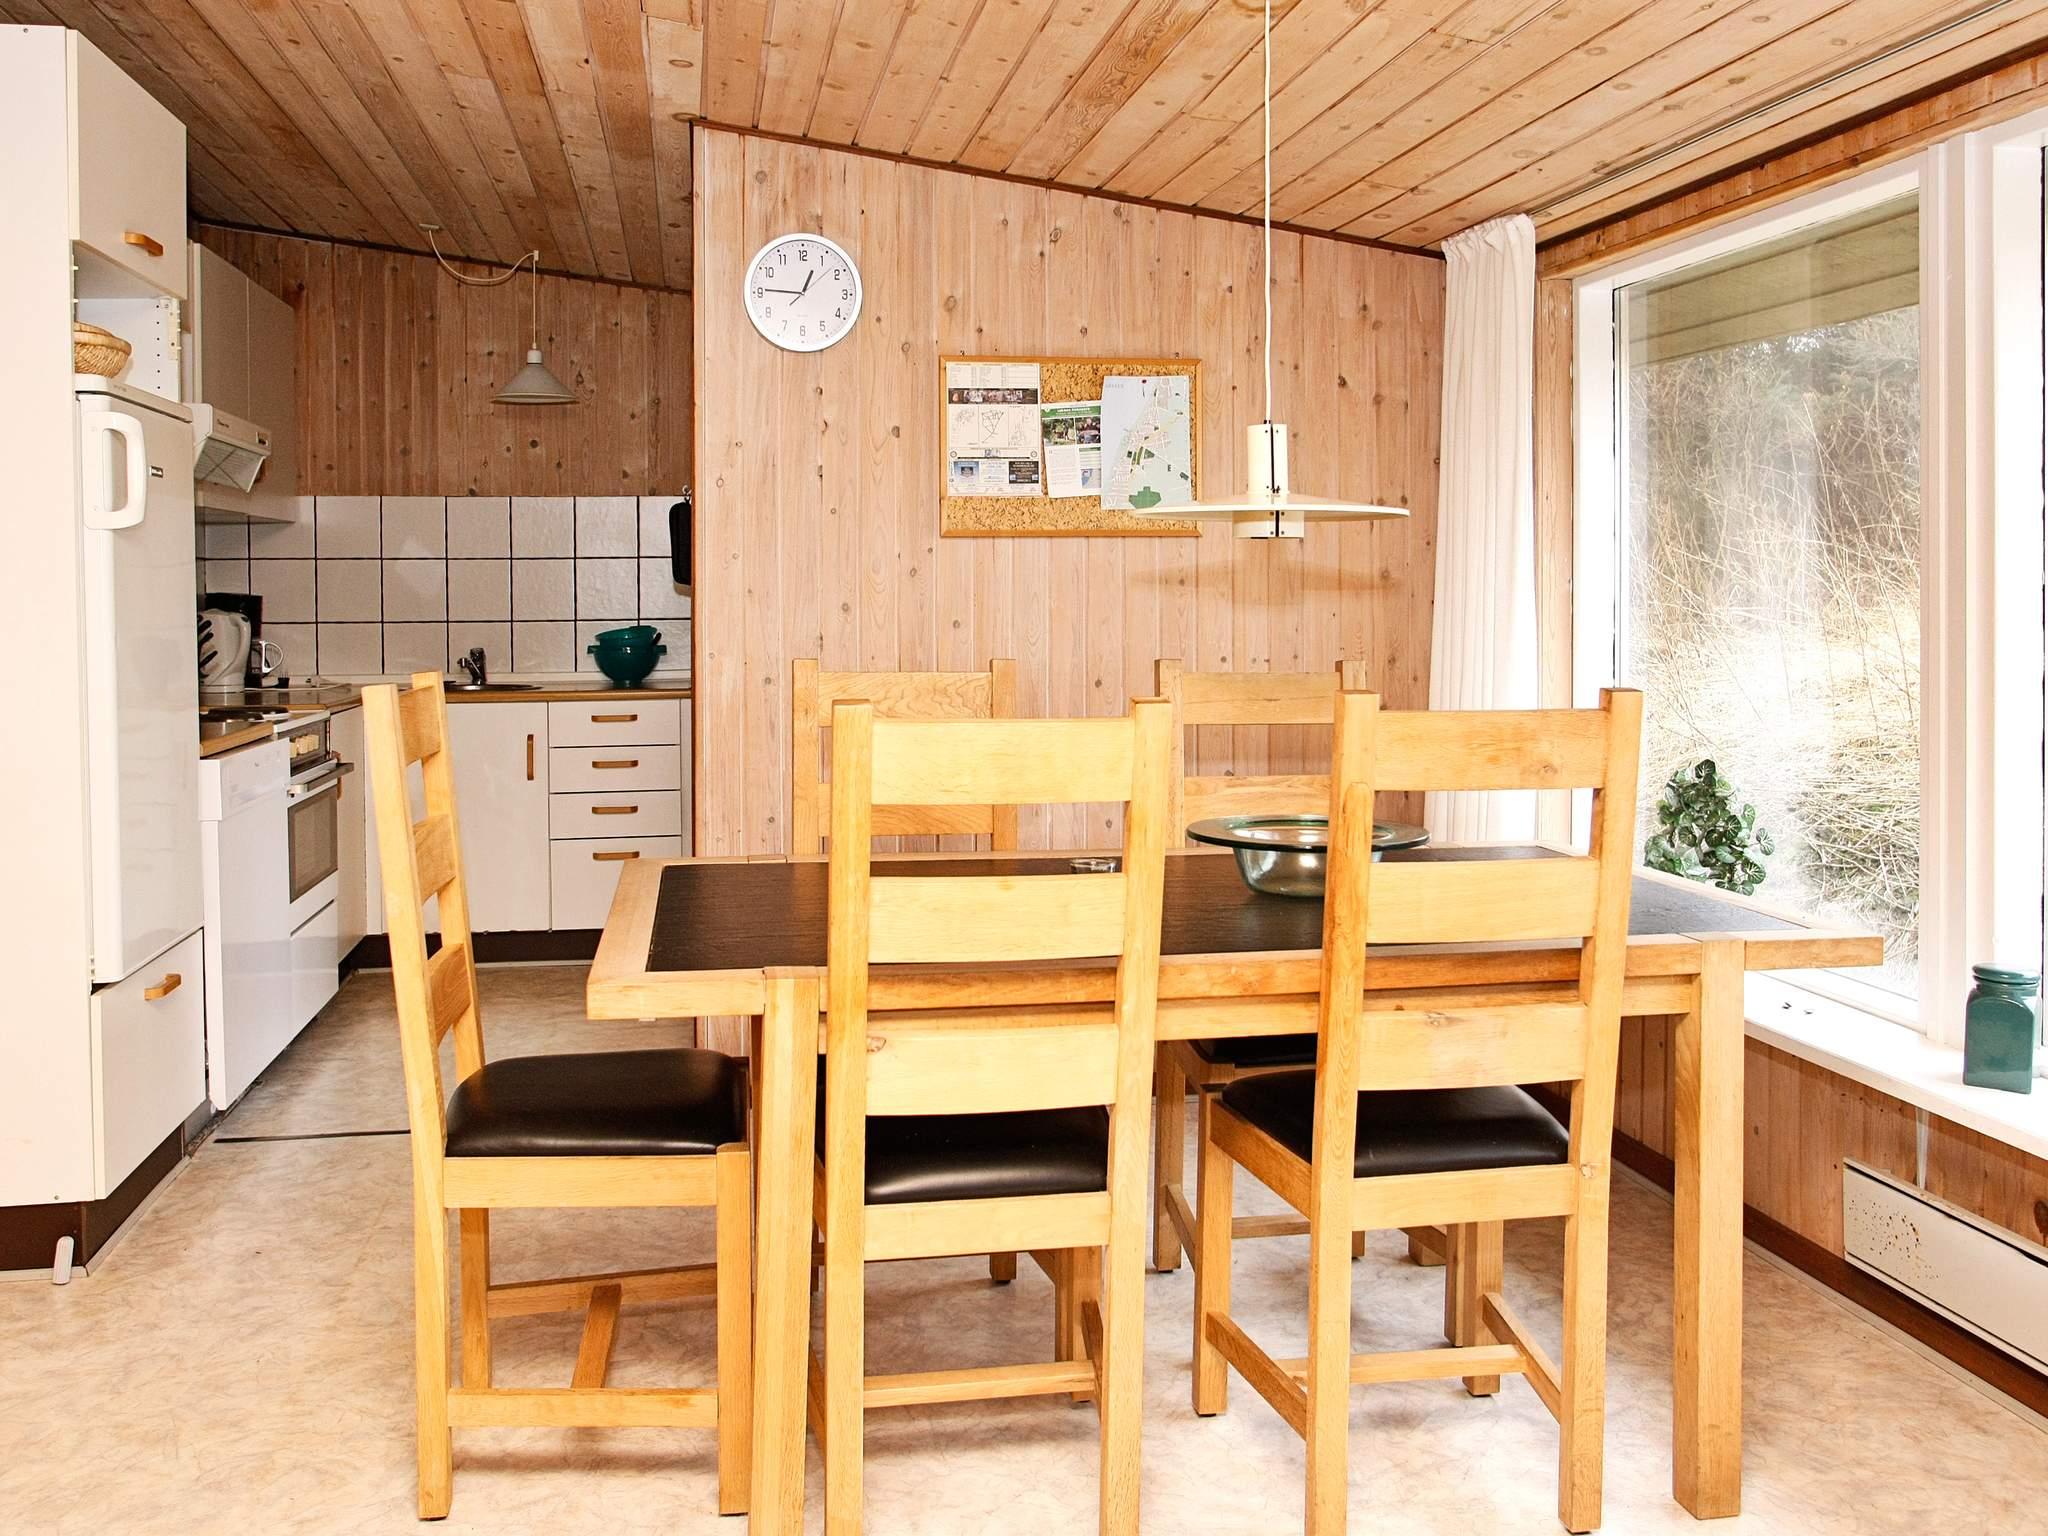 Ferienhaus Nr. Lyngby (89563), Løkken, , Nordwestjütland, Dänemark, Bild 3